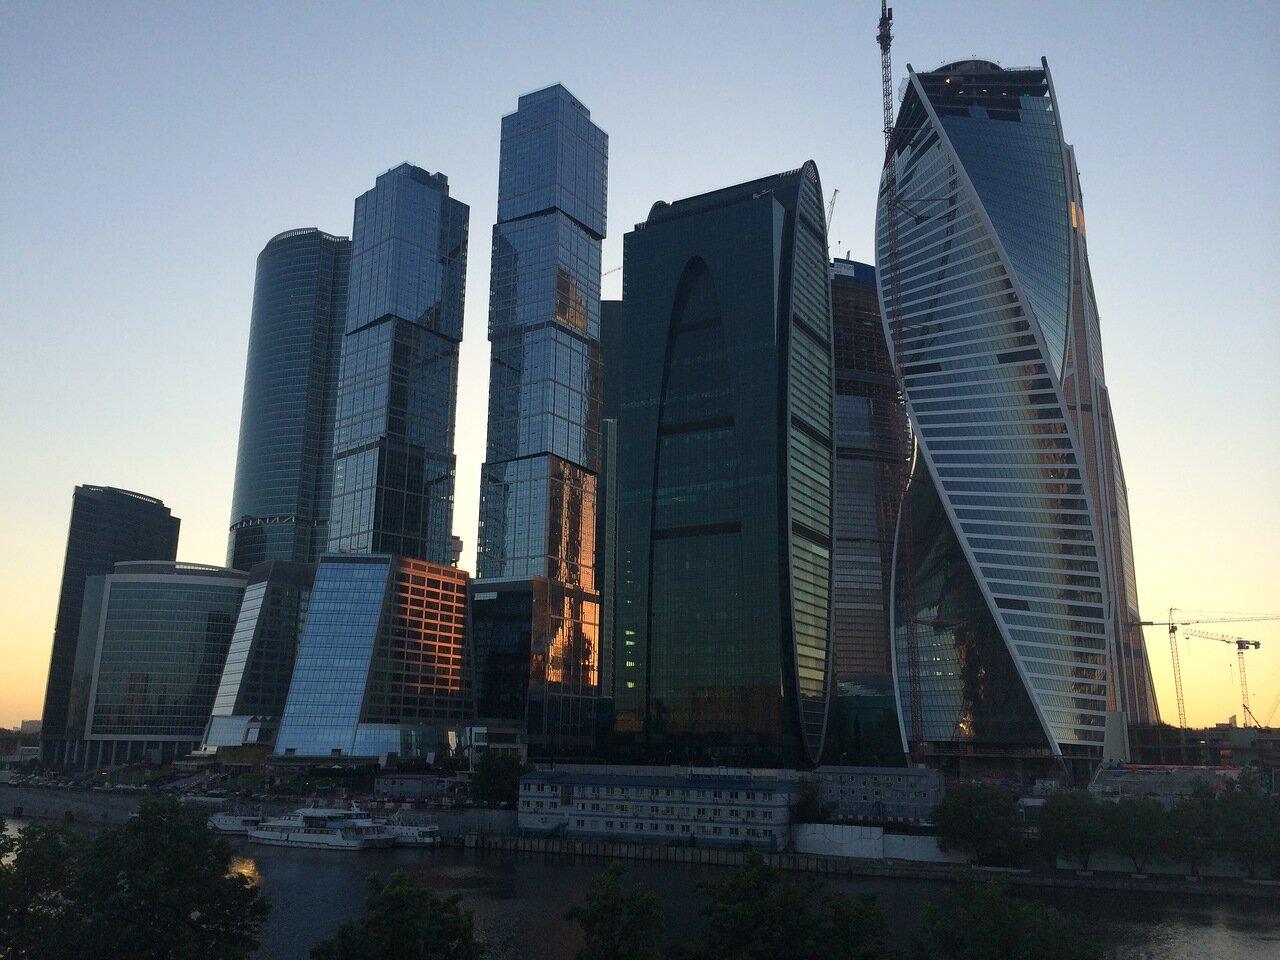 http://img-fotki.yandex.ru/get/9652/82260854.303/0_bf281_38b3e7d7_XXXL.jpg